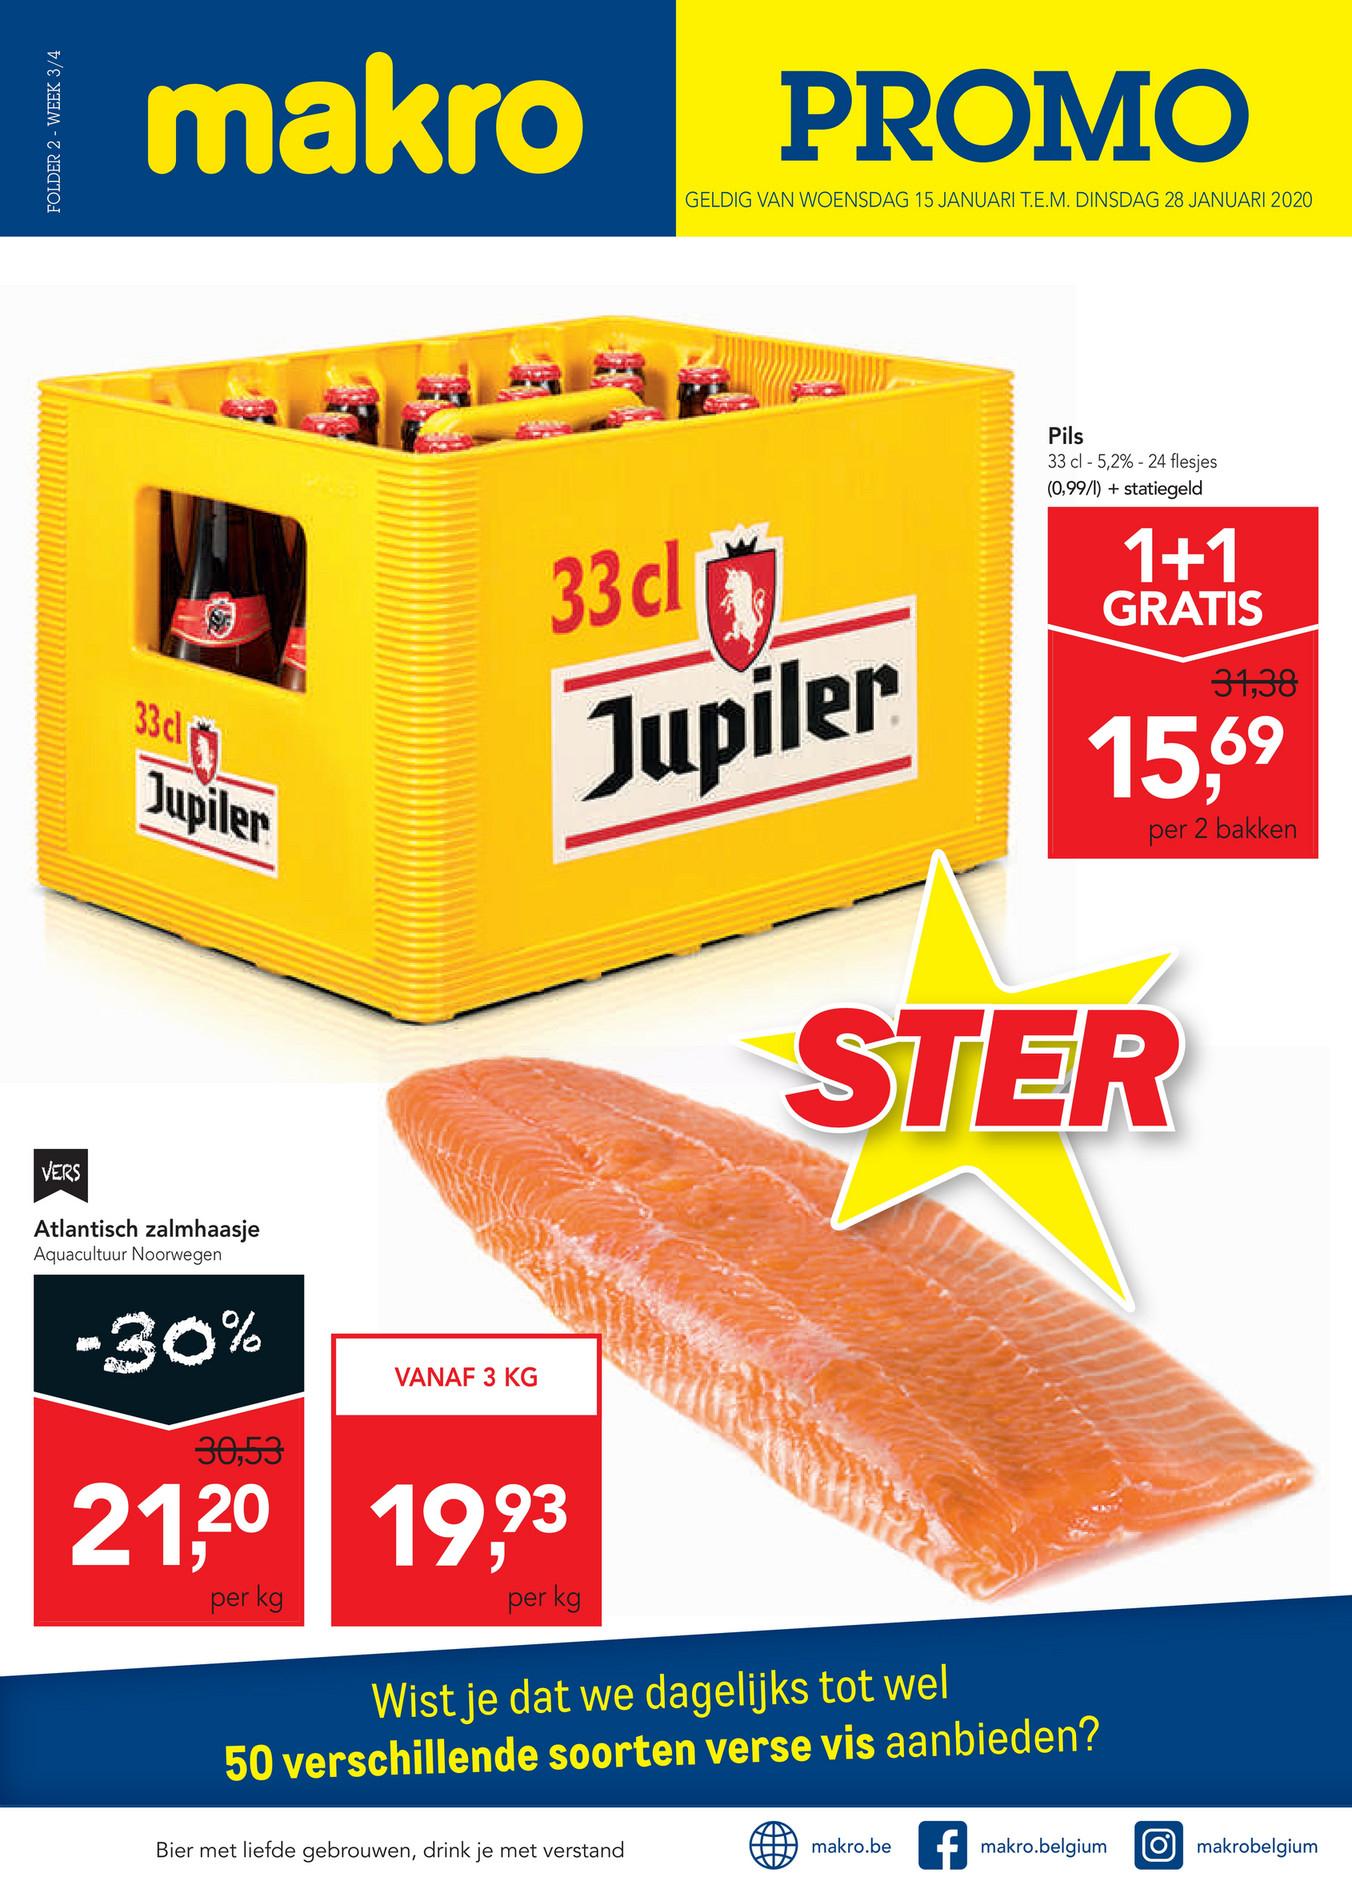 [België] Jupiler kratten (33CL) 1+1 gratis